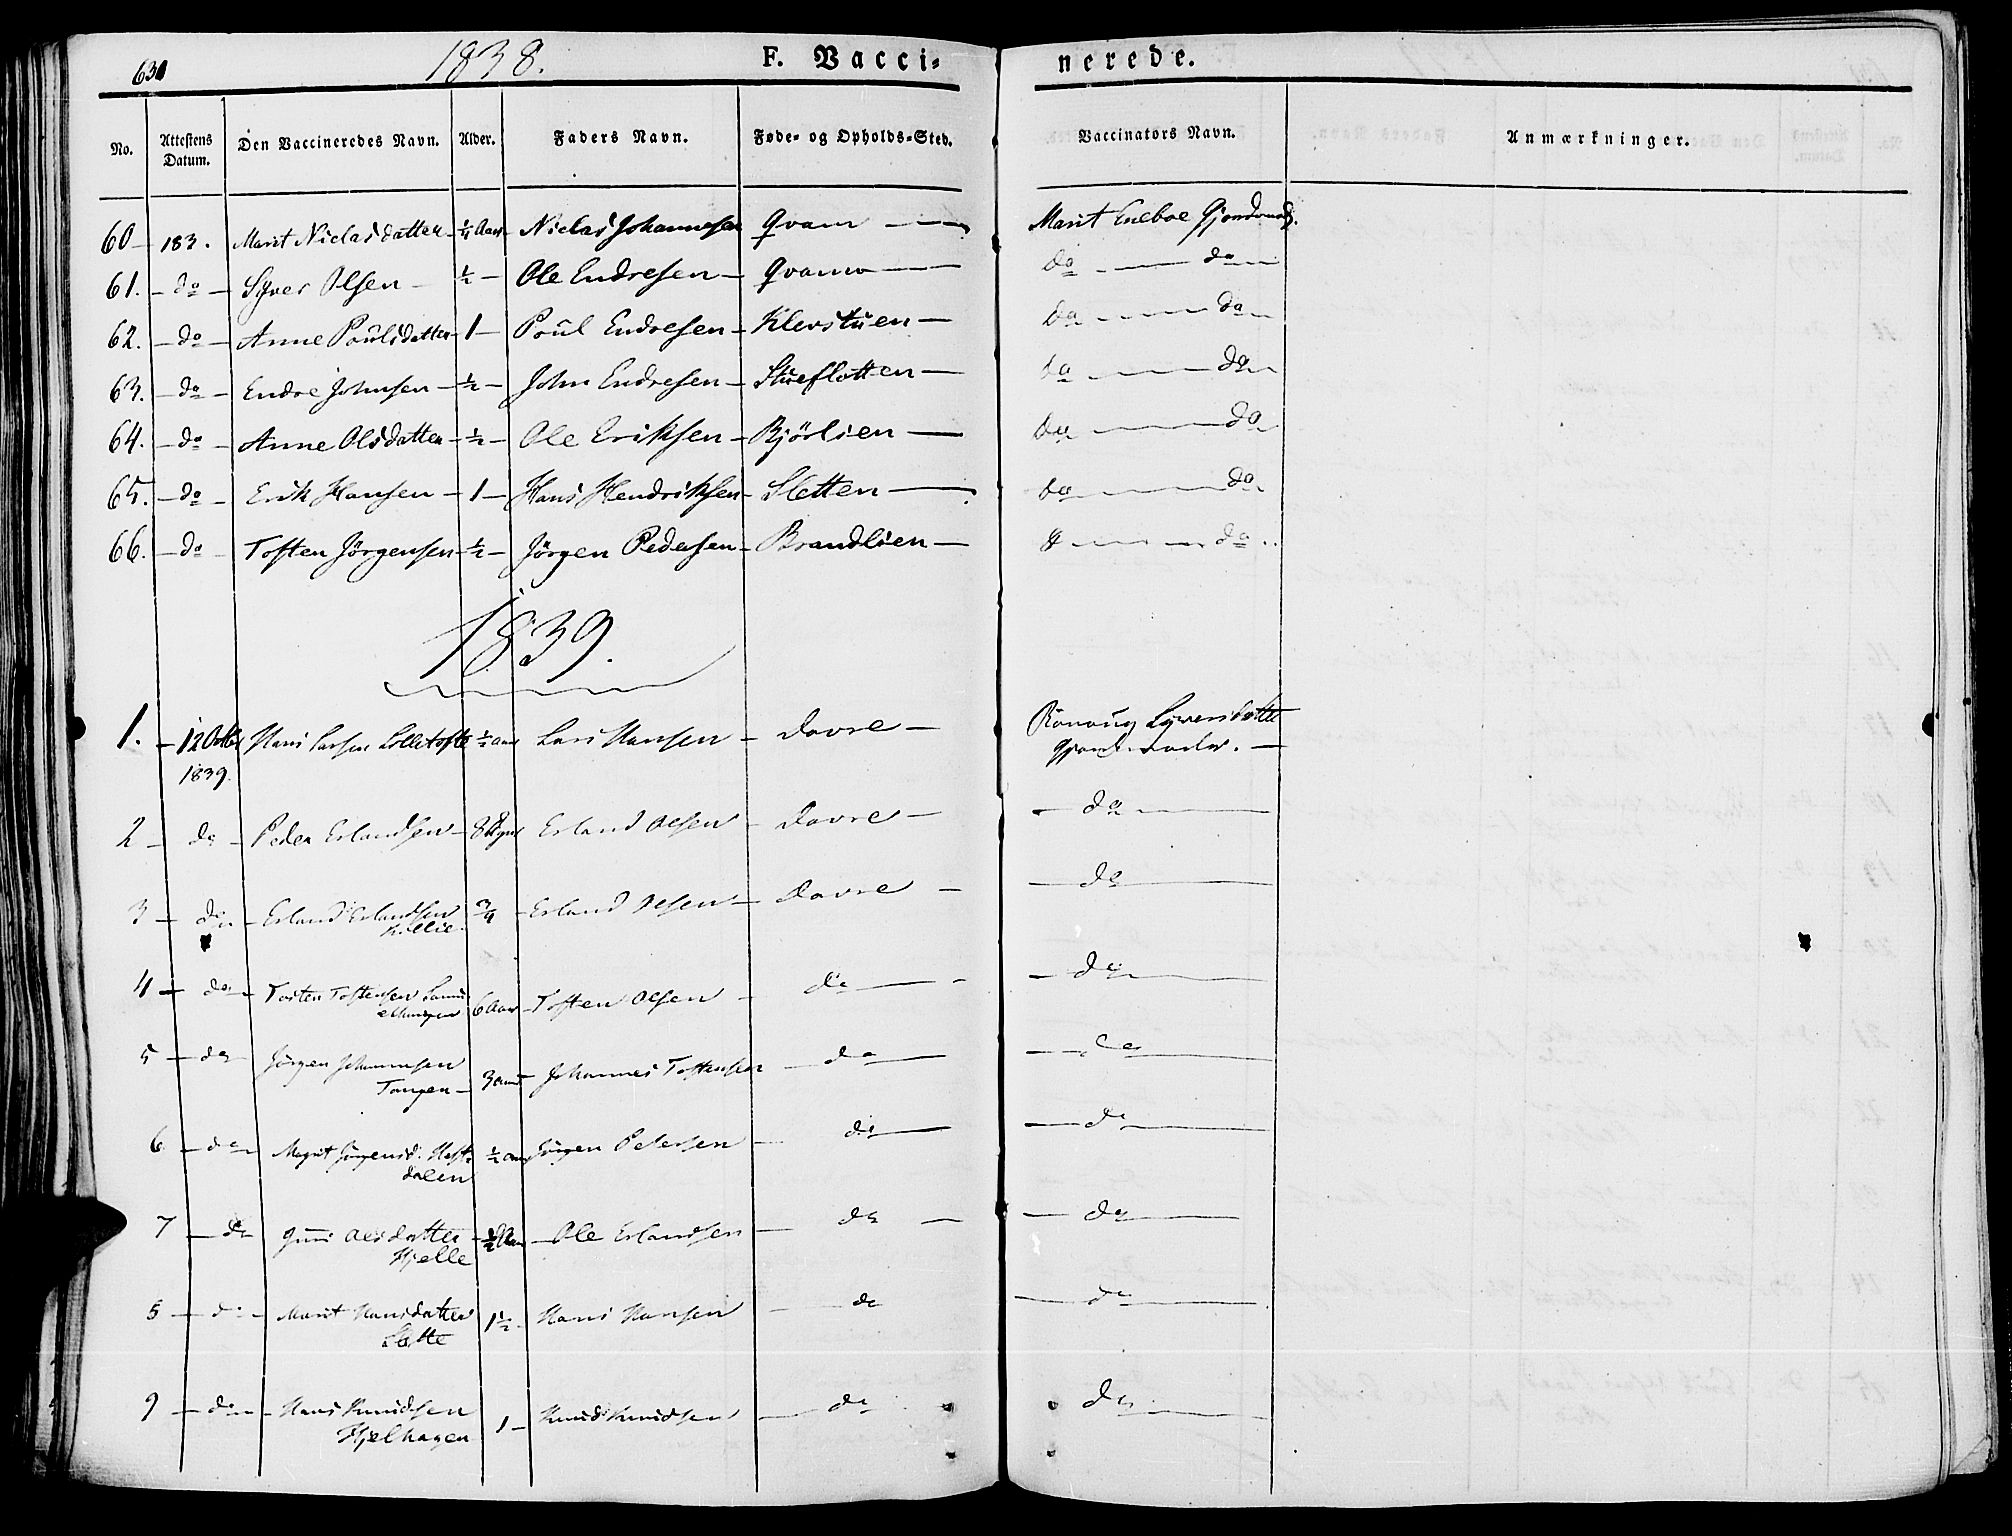 SAH, Lesja prestekontor, Ministerialbok nr. 5, 1830-1842, s. 631